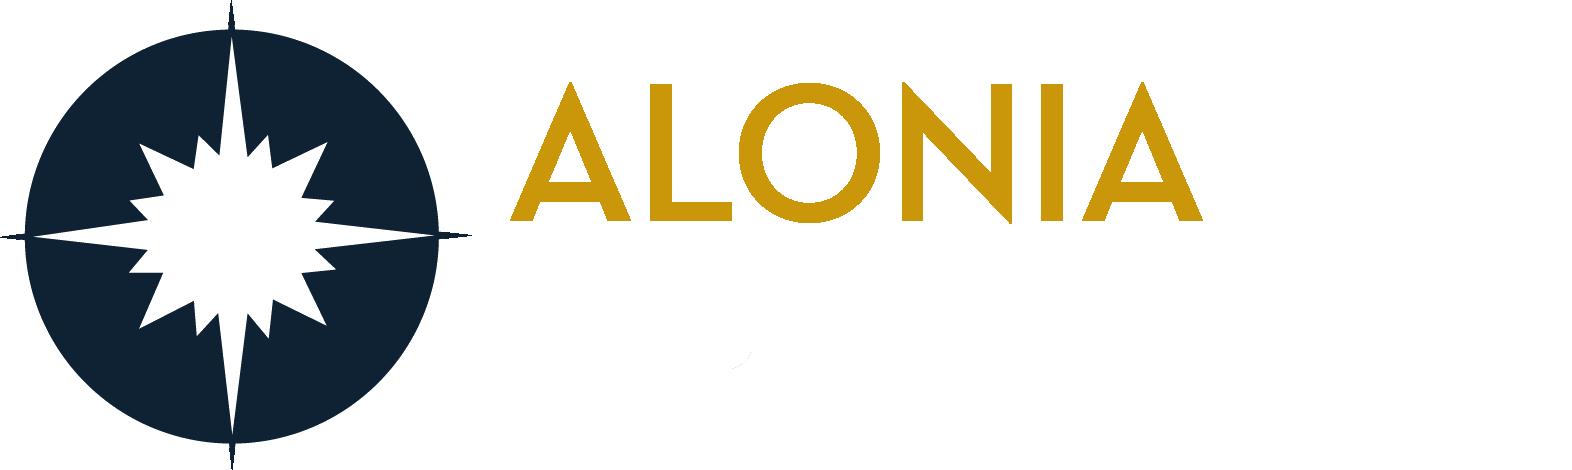 Alonia Bestattungen